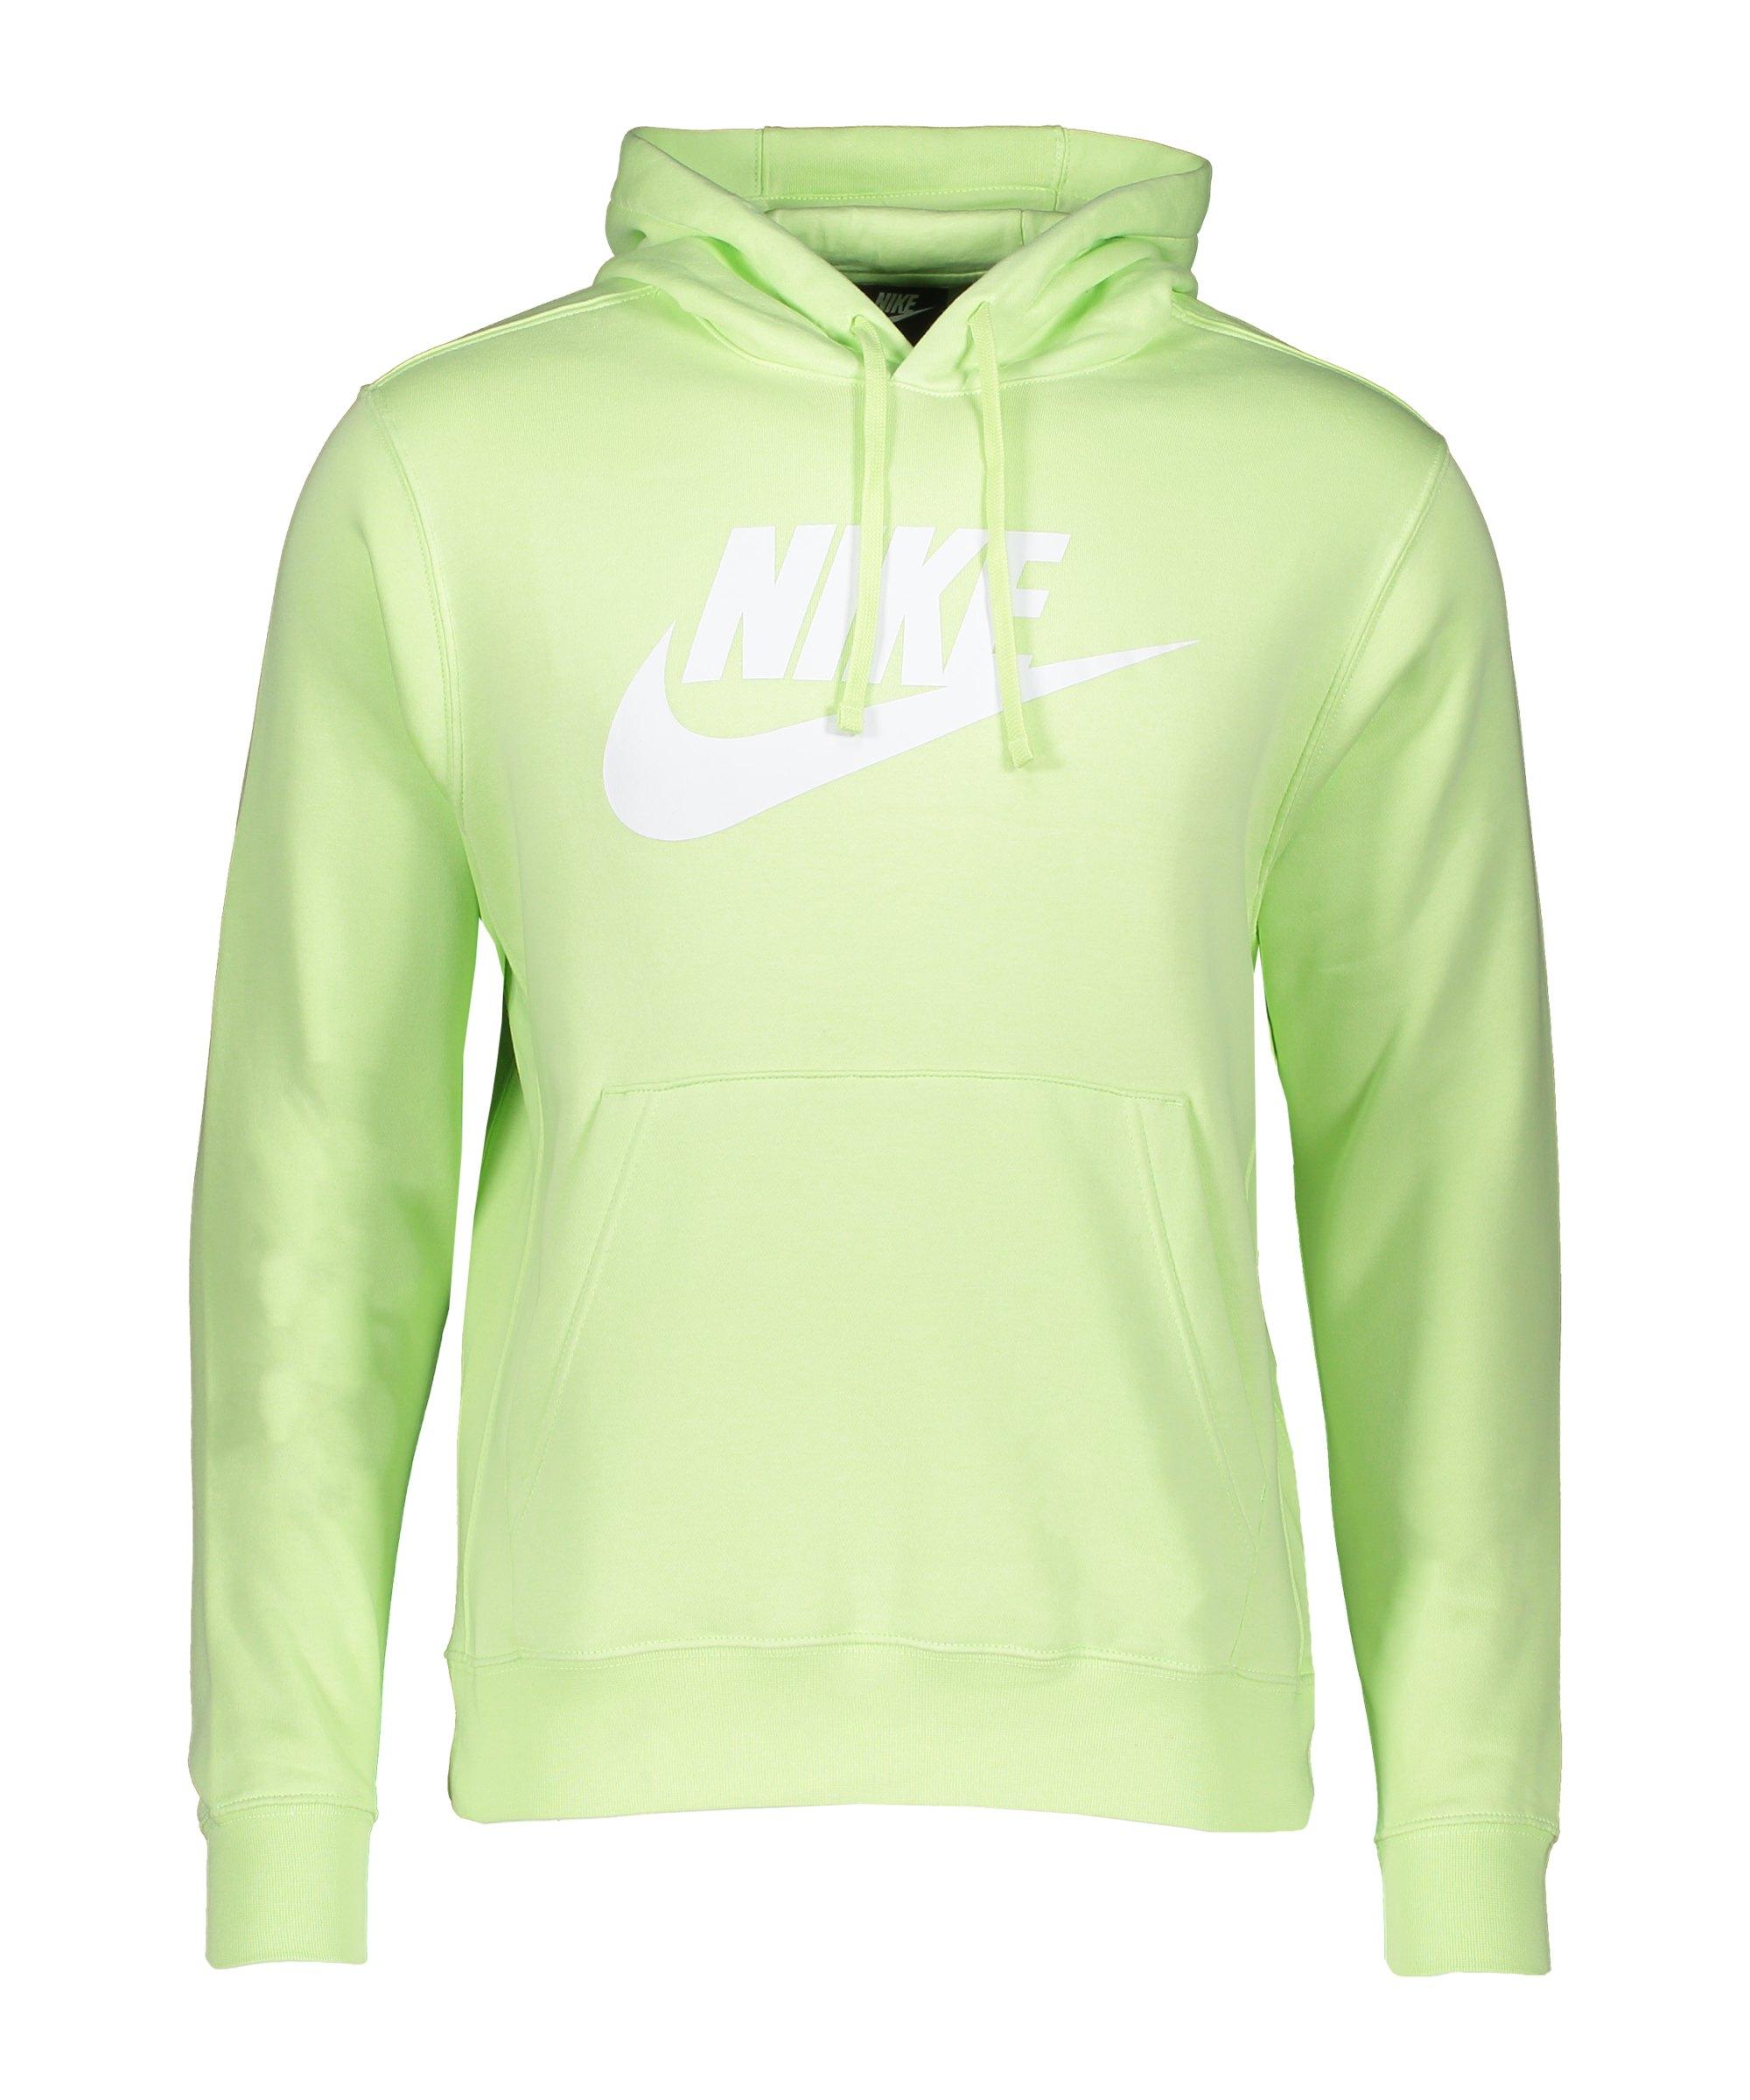 Nike Club Fleece Hoody Gelb F383 - gruen